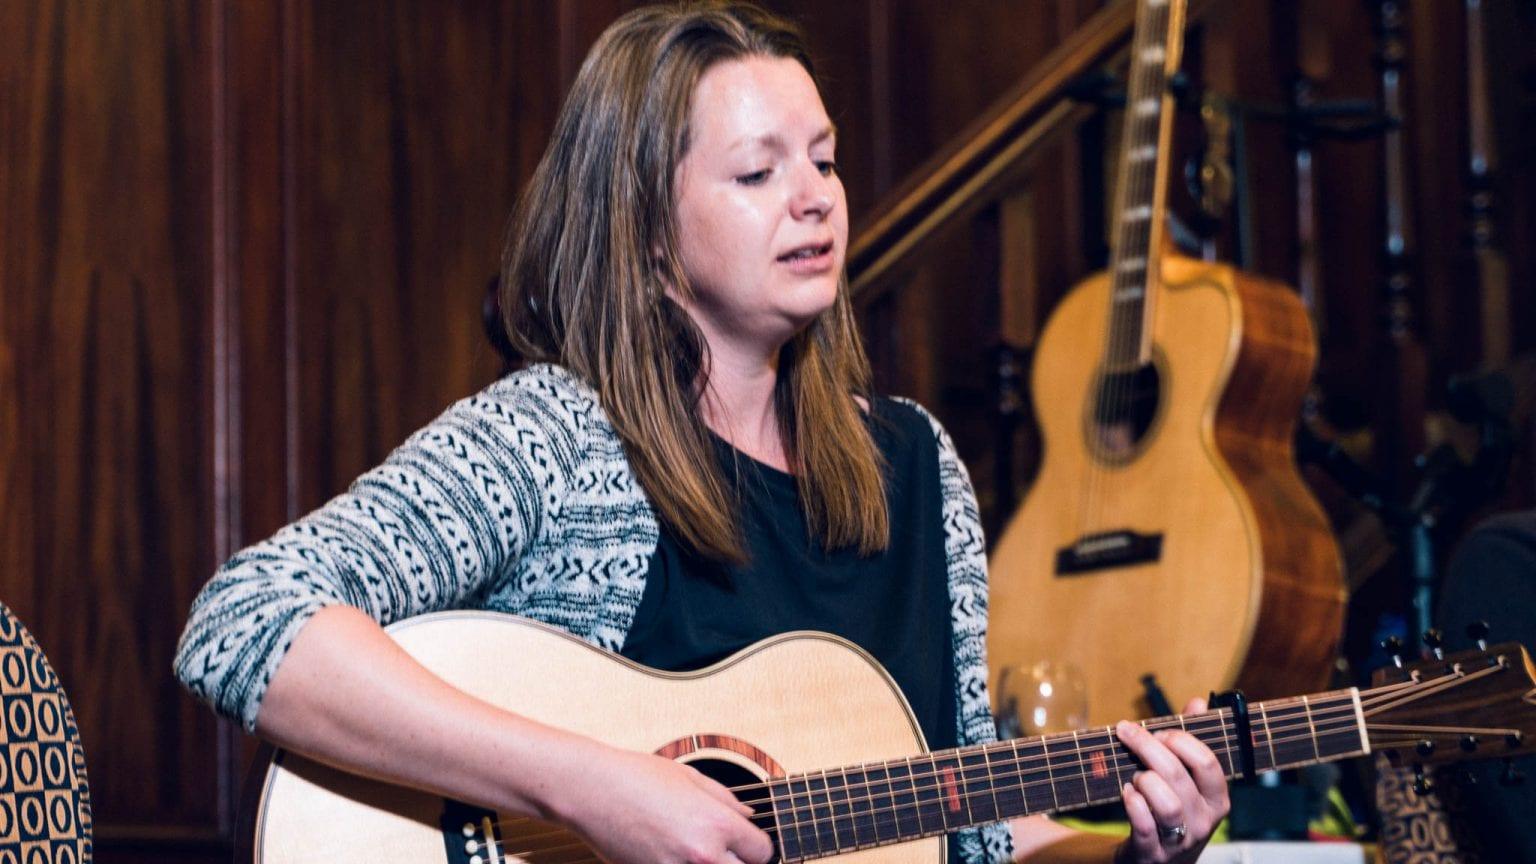 Rosie Heydenrych of Turnstone Guitars